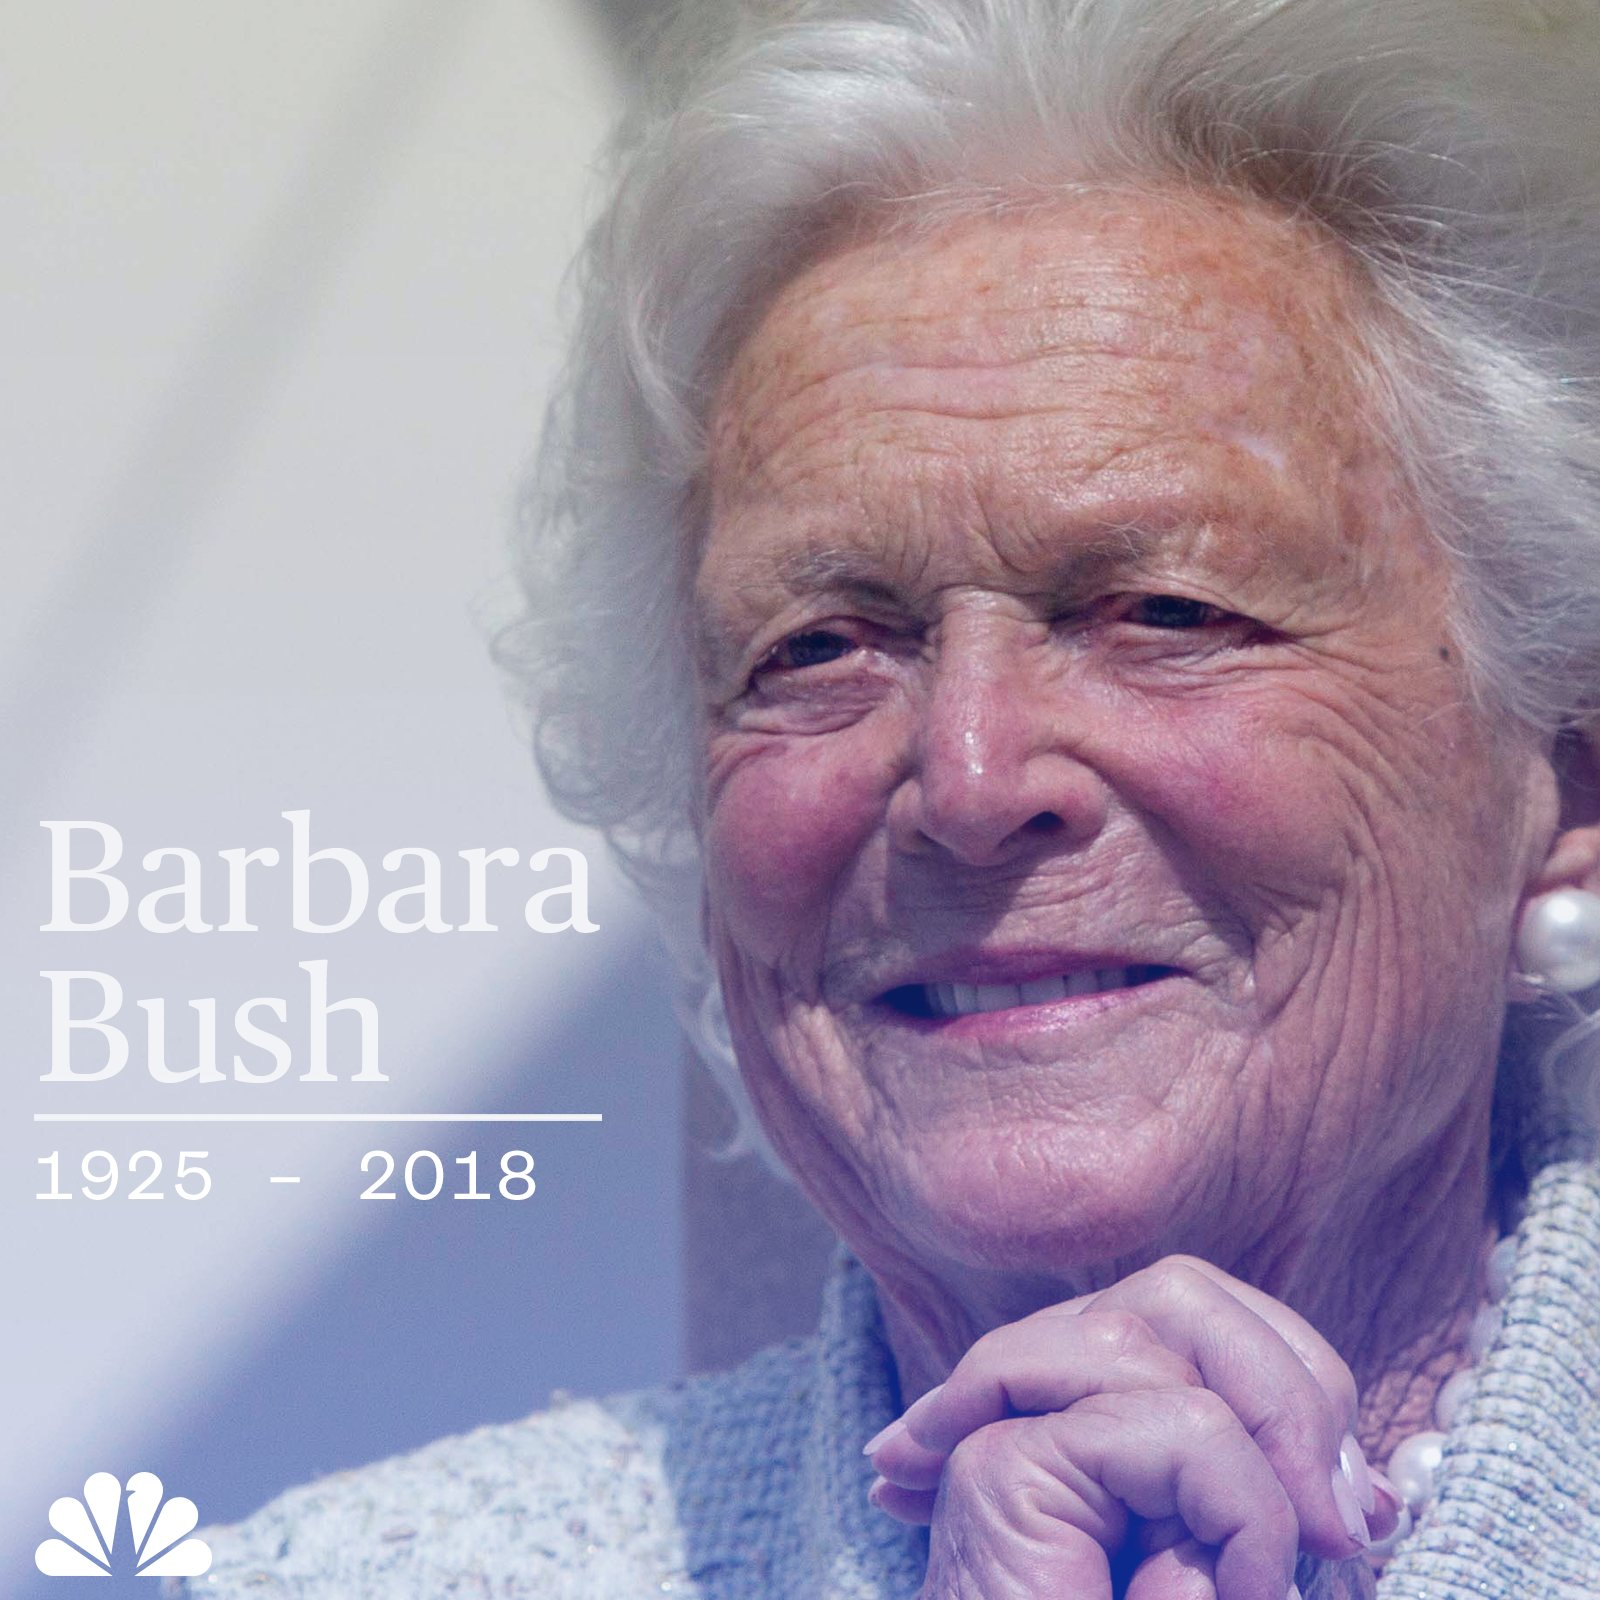 BREAKING: Former First Lady Barbara Bush has passed away at 92, according to a Bush family spokesperson. https://t.co/UveetFuz72